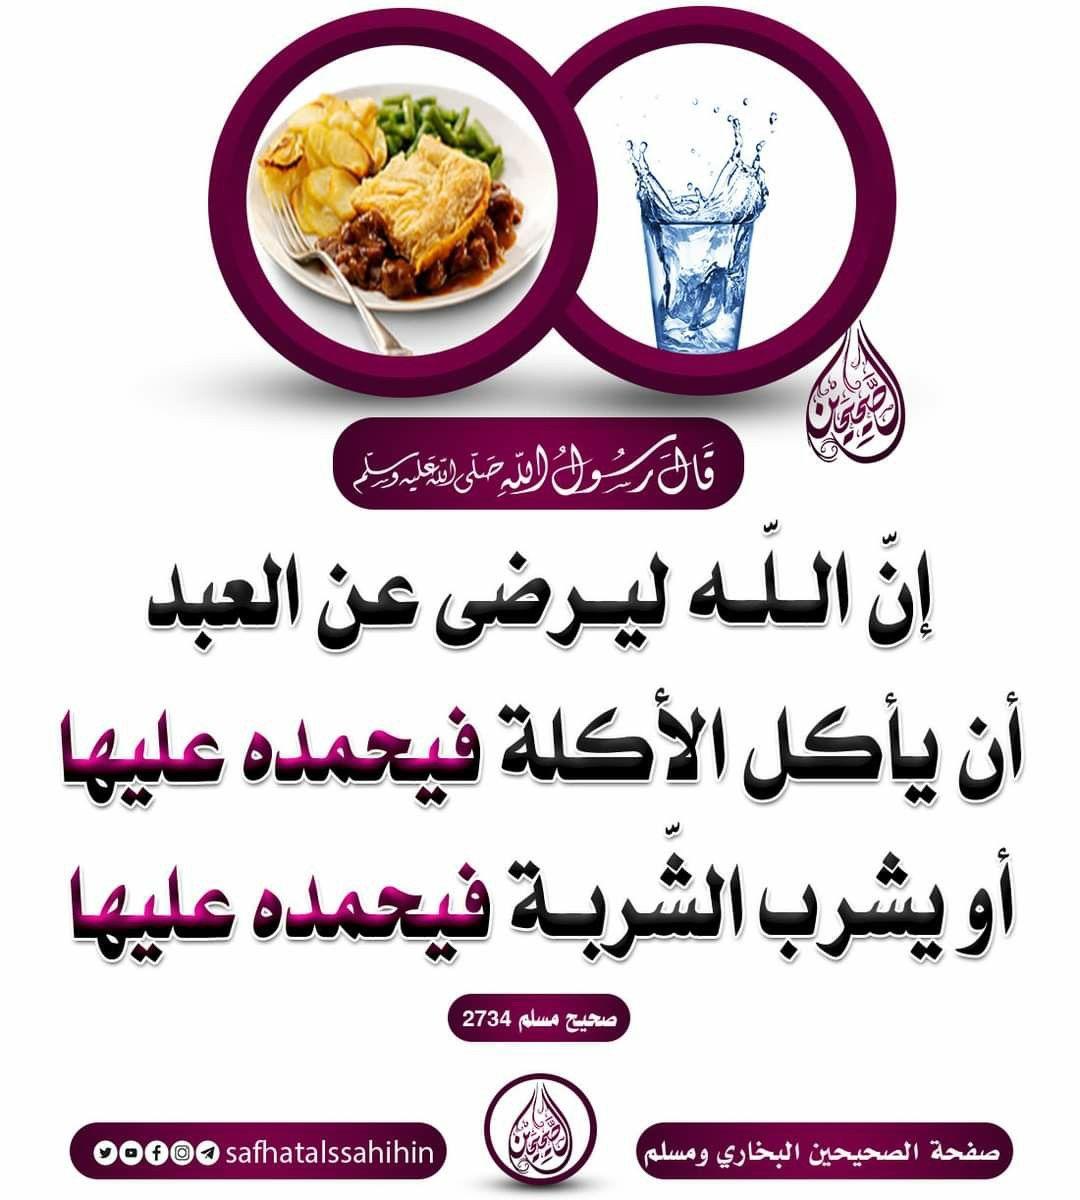 Pin By Maged Egy On الأحاديث النبوية الشريفة In 2021 Islam Facts Islamic Quotes Hadith